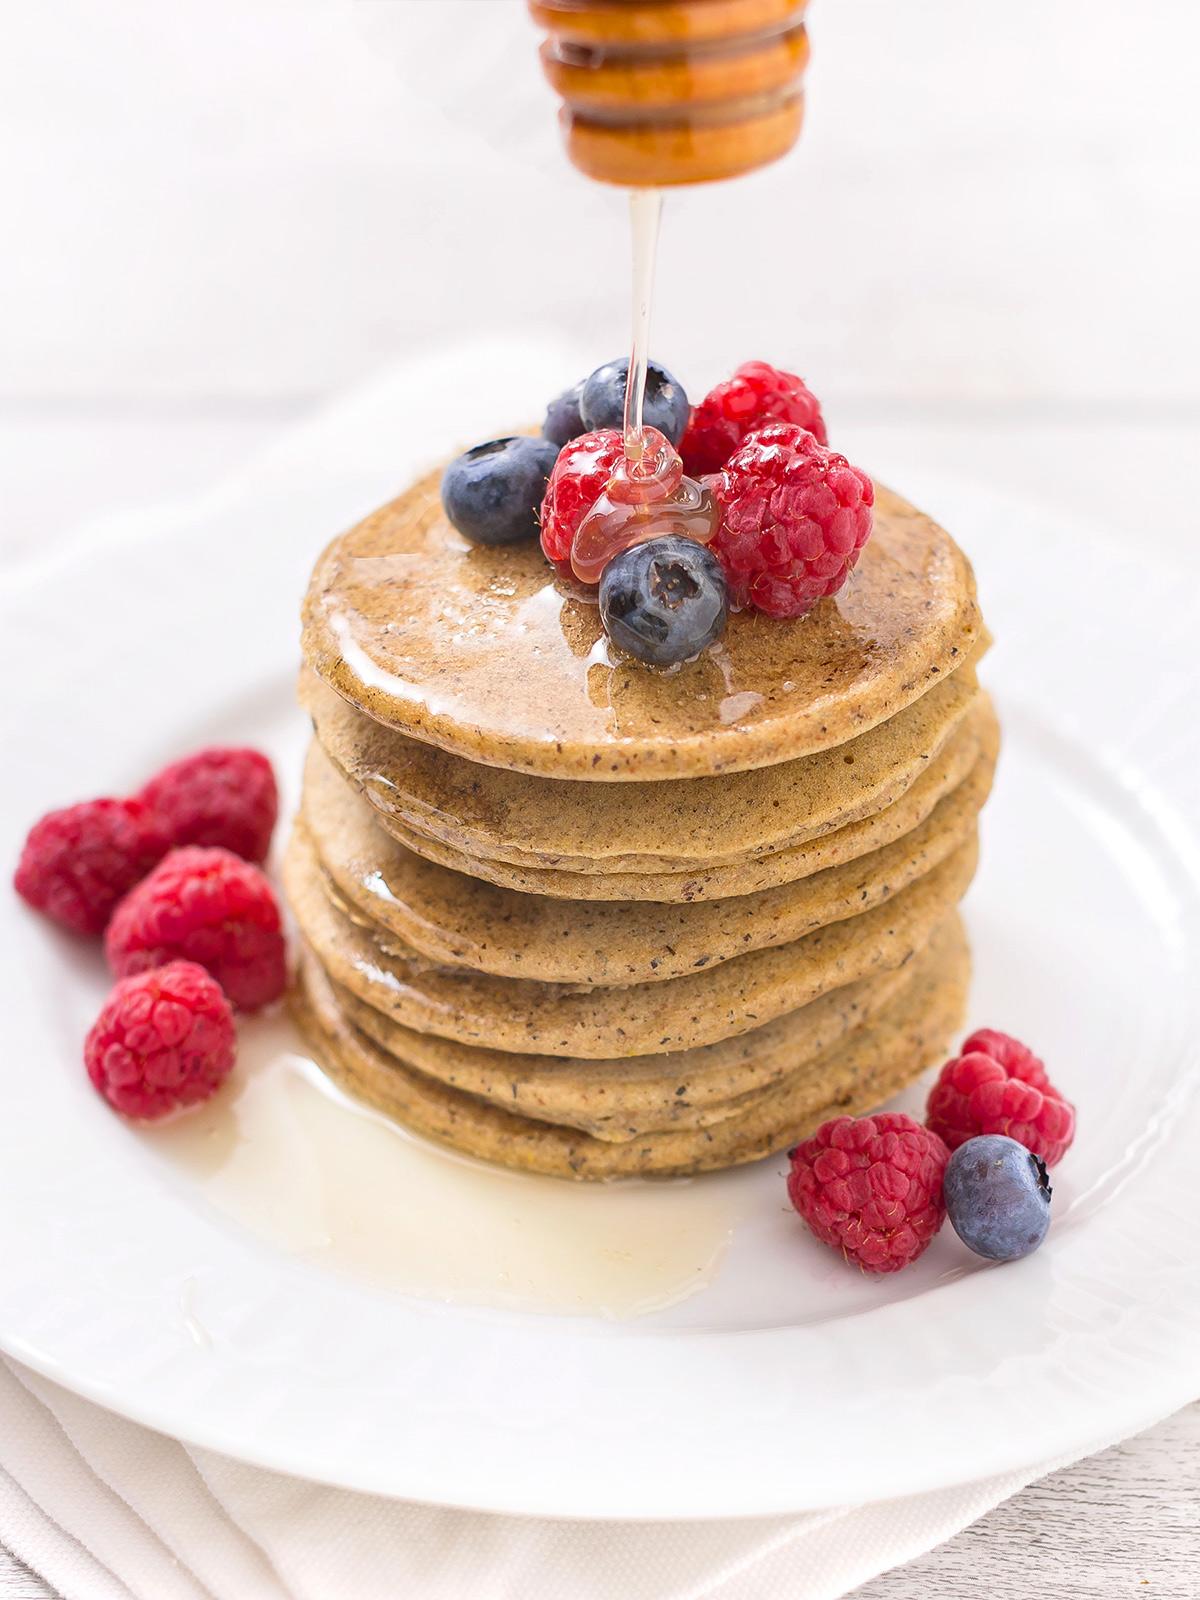 pancakes light senza uova senza burro senza glutine facili ricetta base pancakes vegan senza glutine al grano saraceno - easy vegan glutenfree buckwheat pancakes